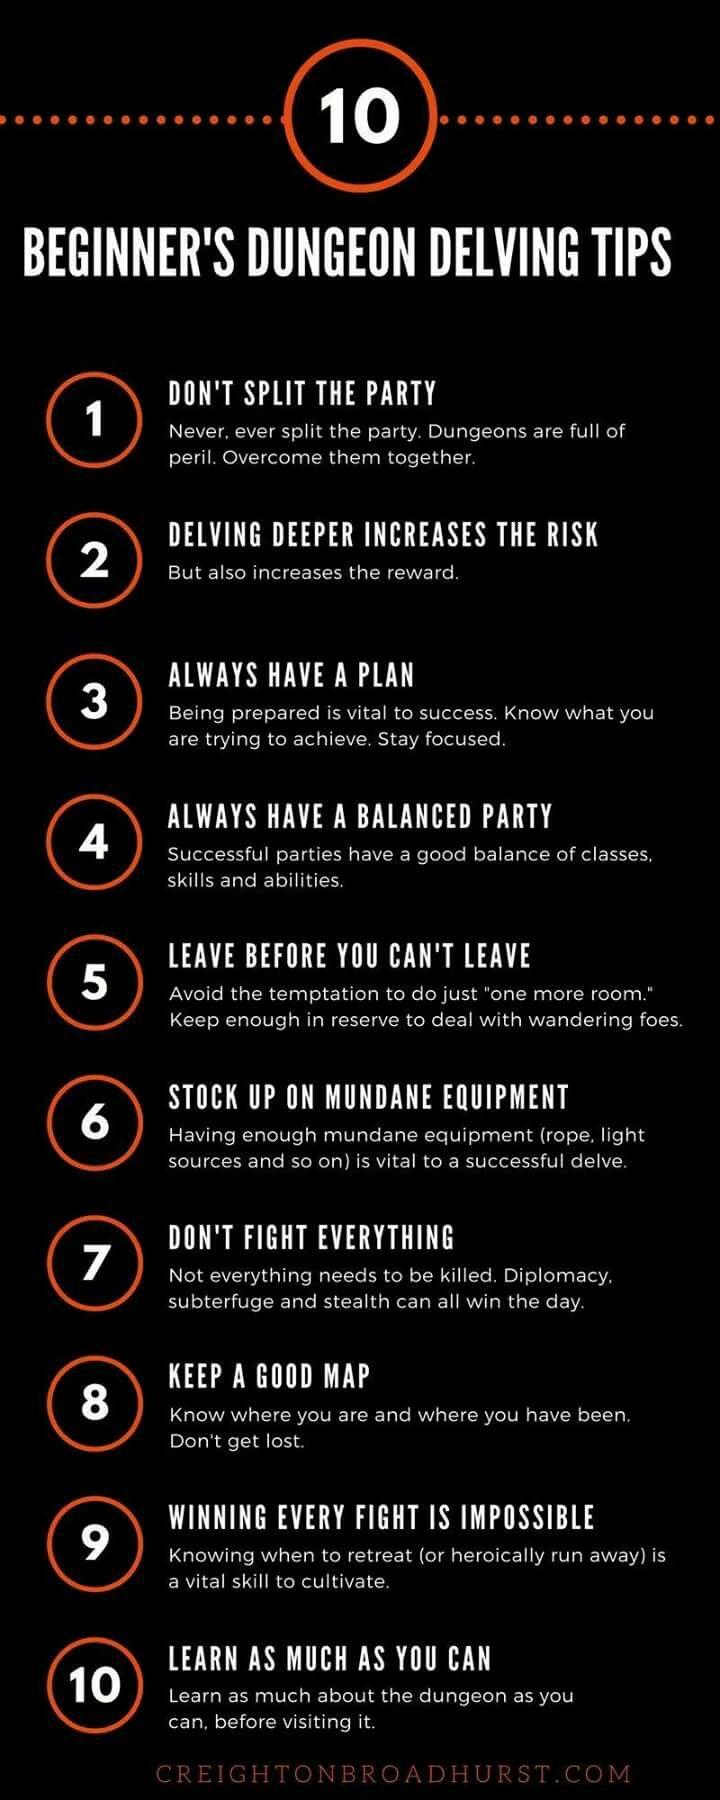 10 Tips for Old-School Dungeoneering